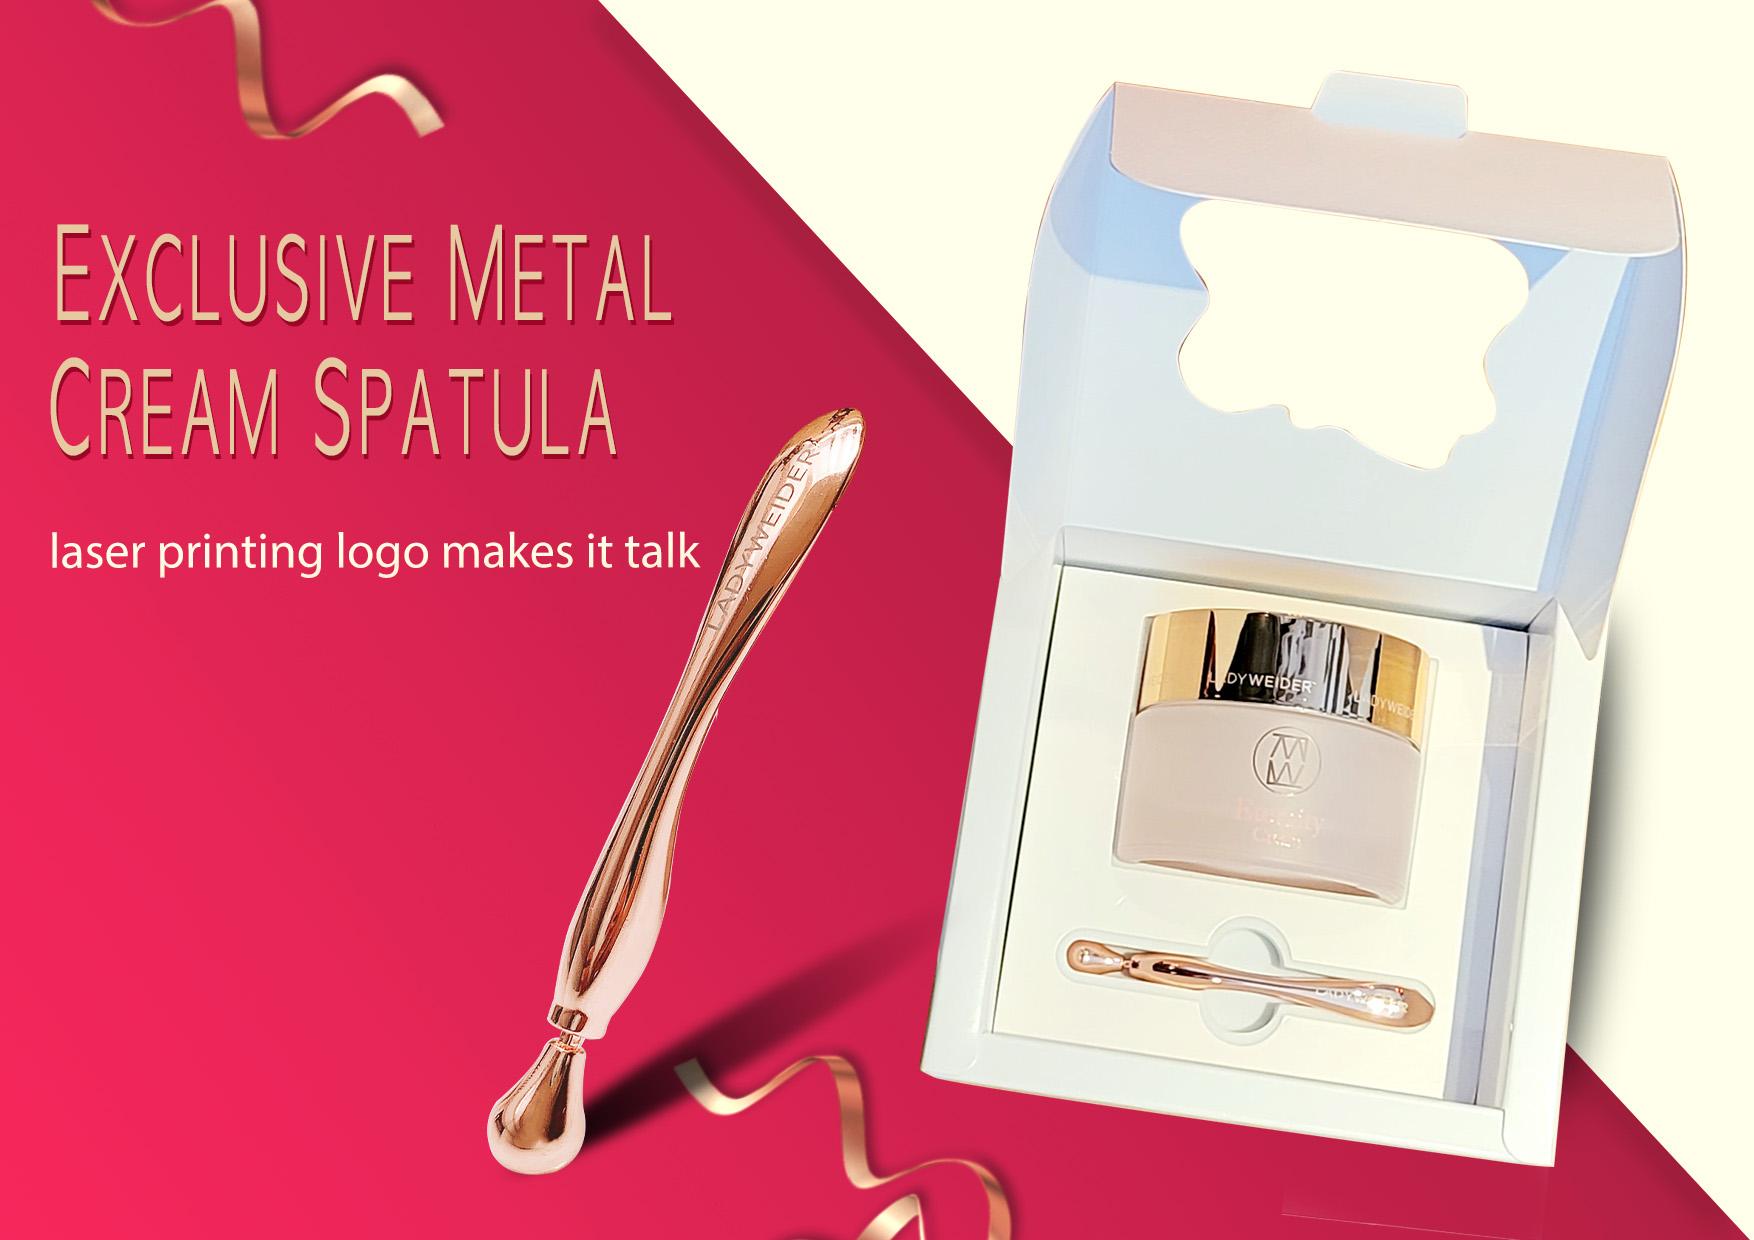 metal cosmetic spatula. spatula, cream jar, cream spatula